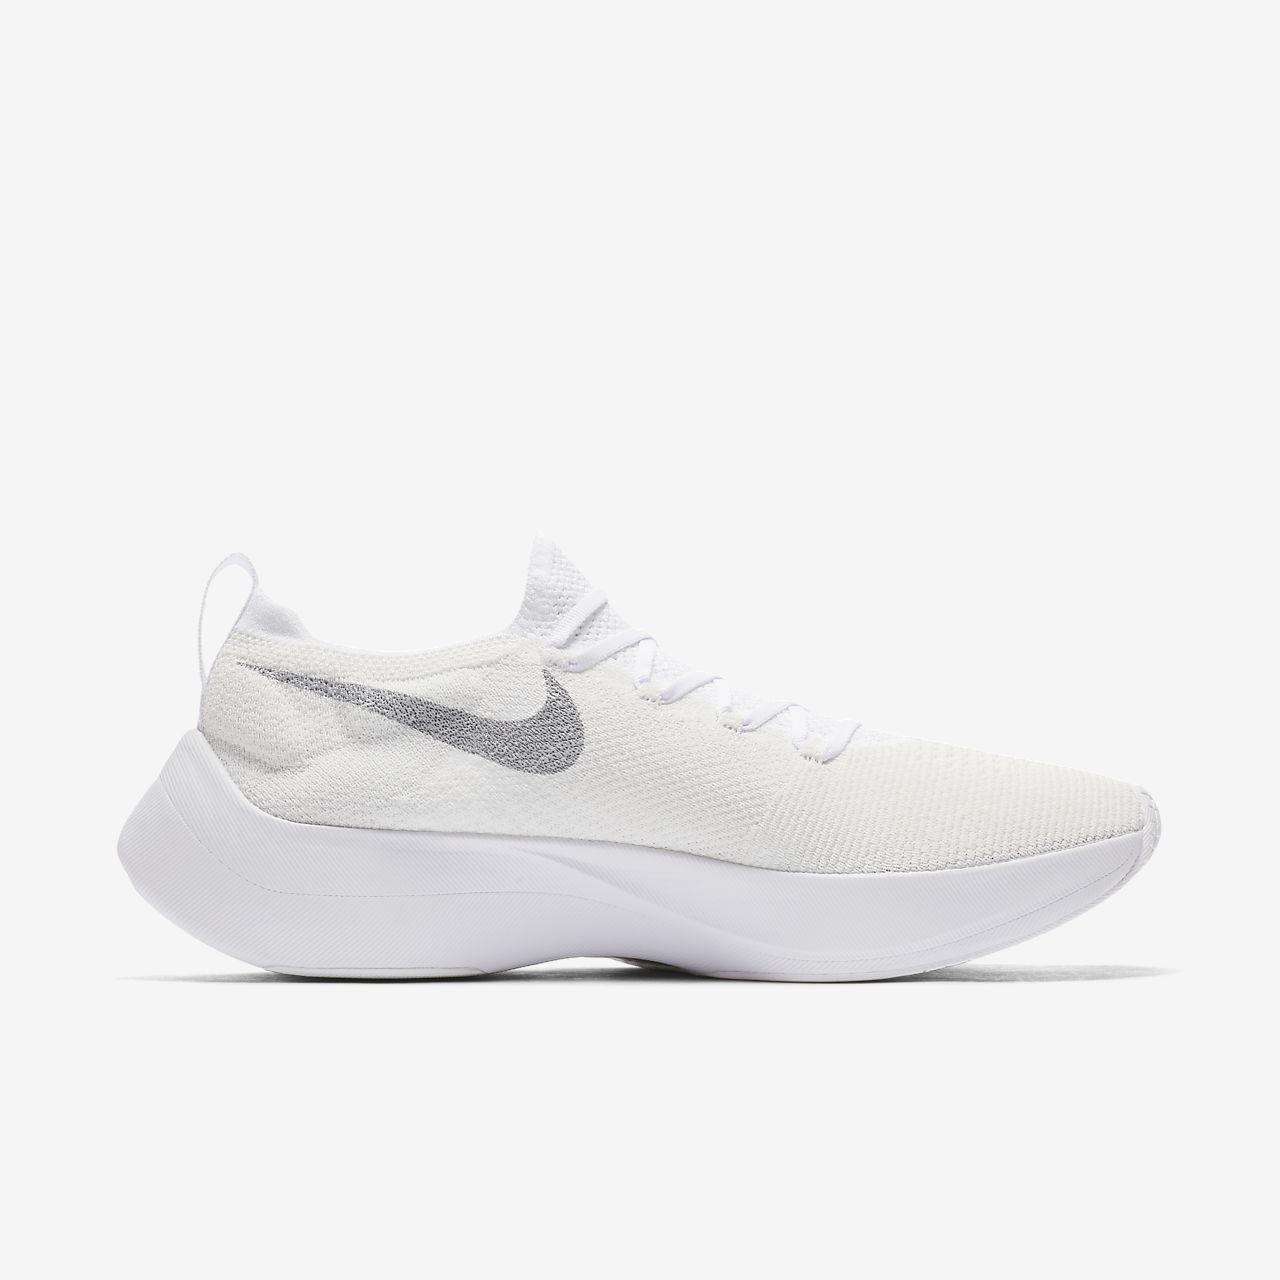 the best attitude 26a4f 61c66 Nike React Vapor Street Flyknit Men's Shoe